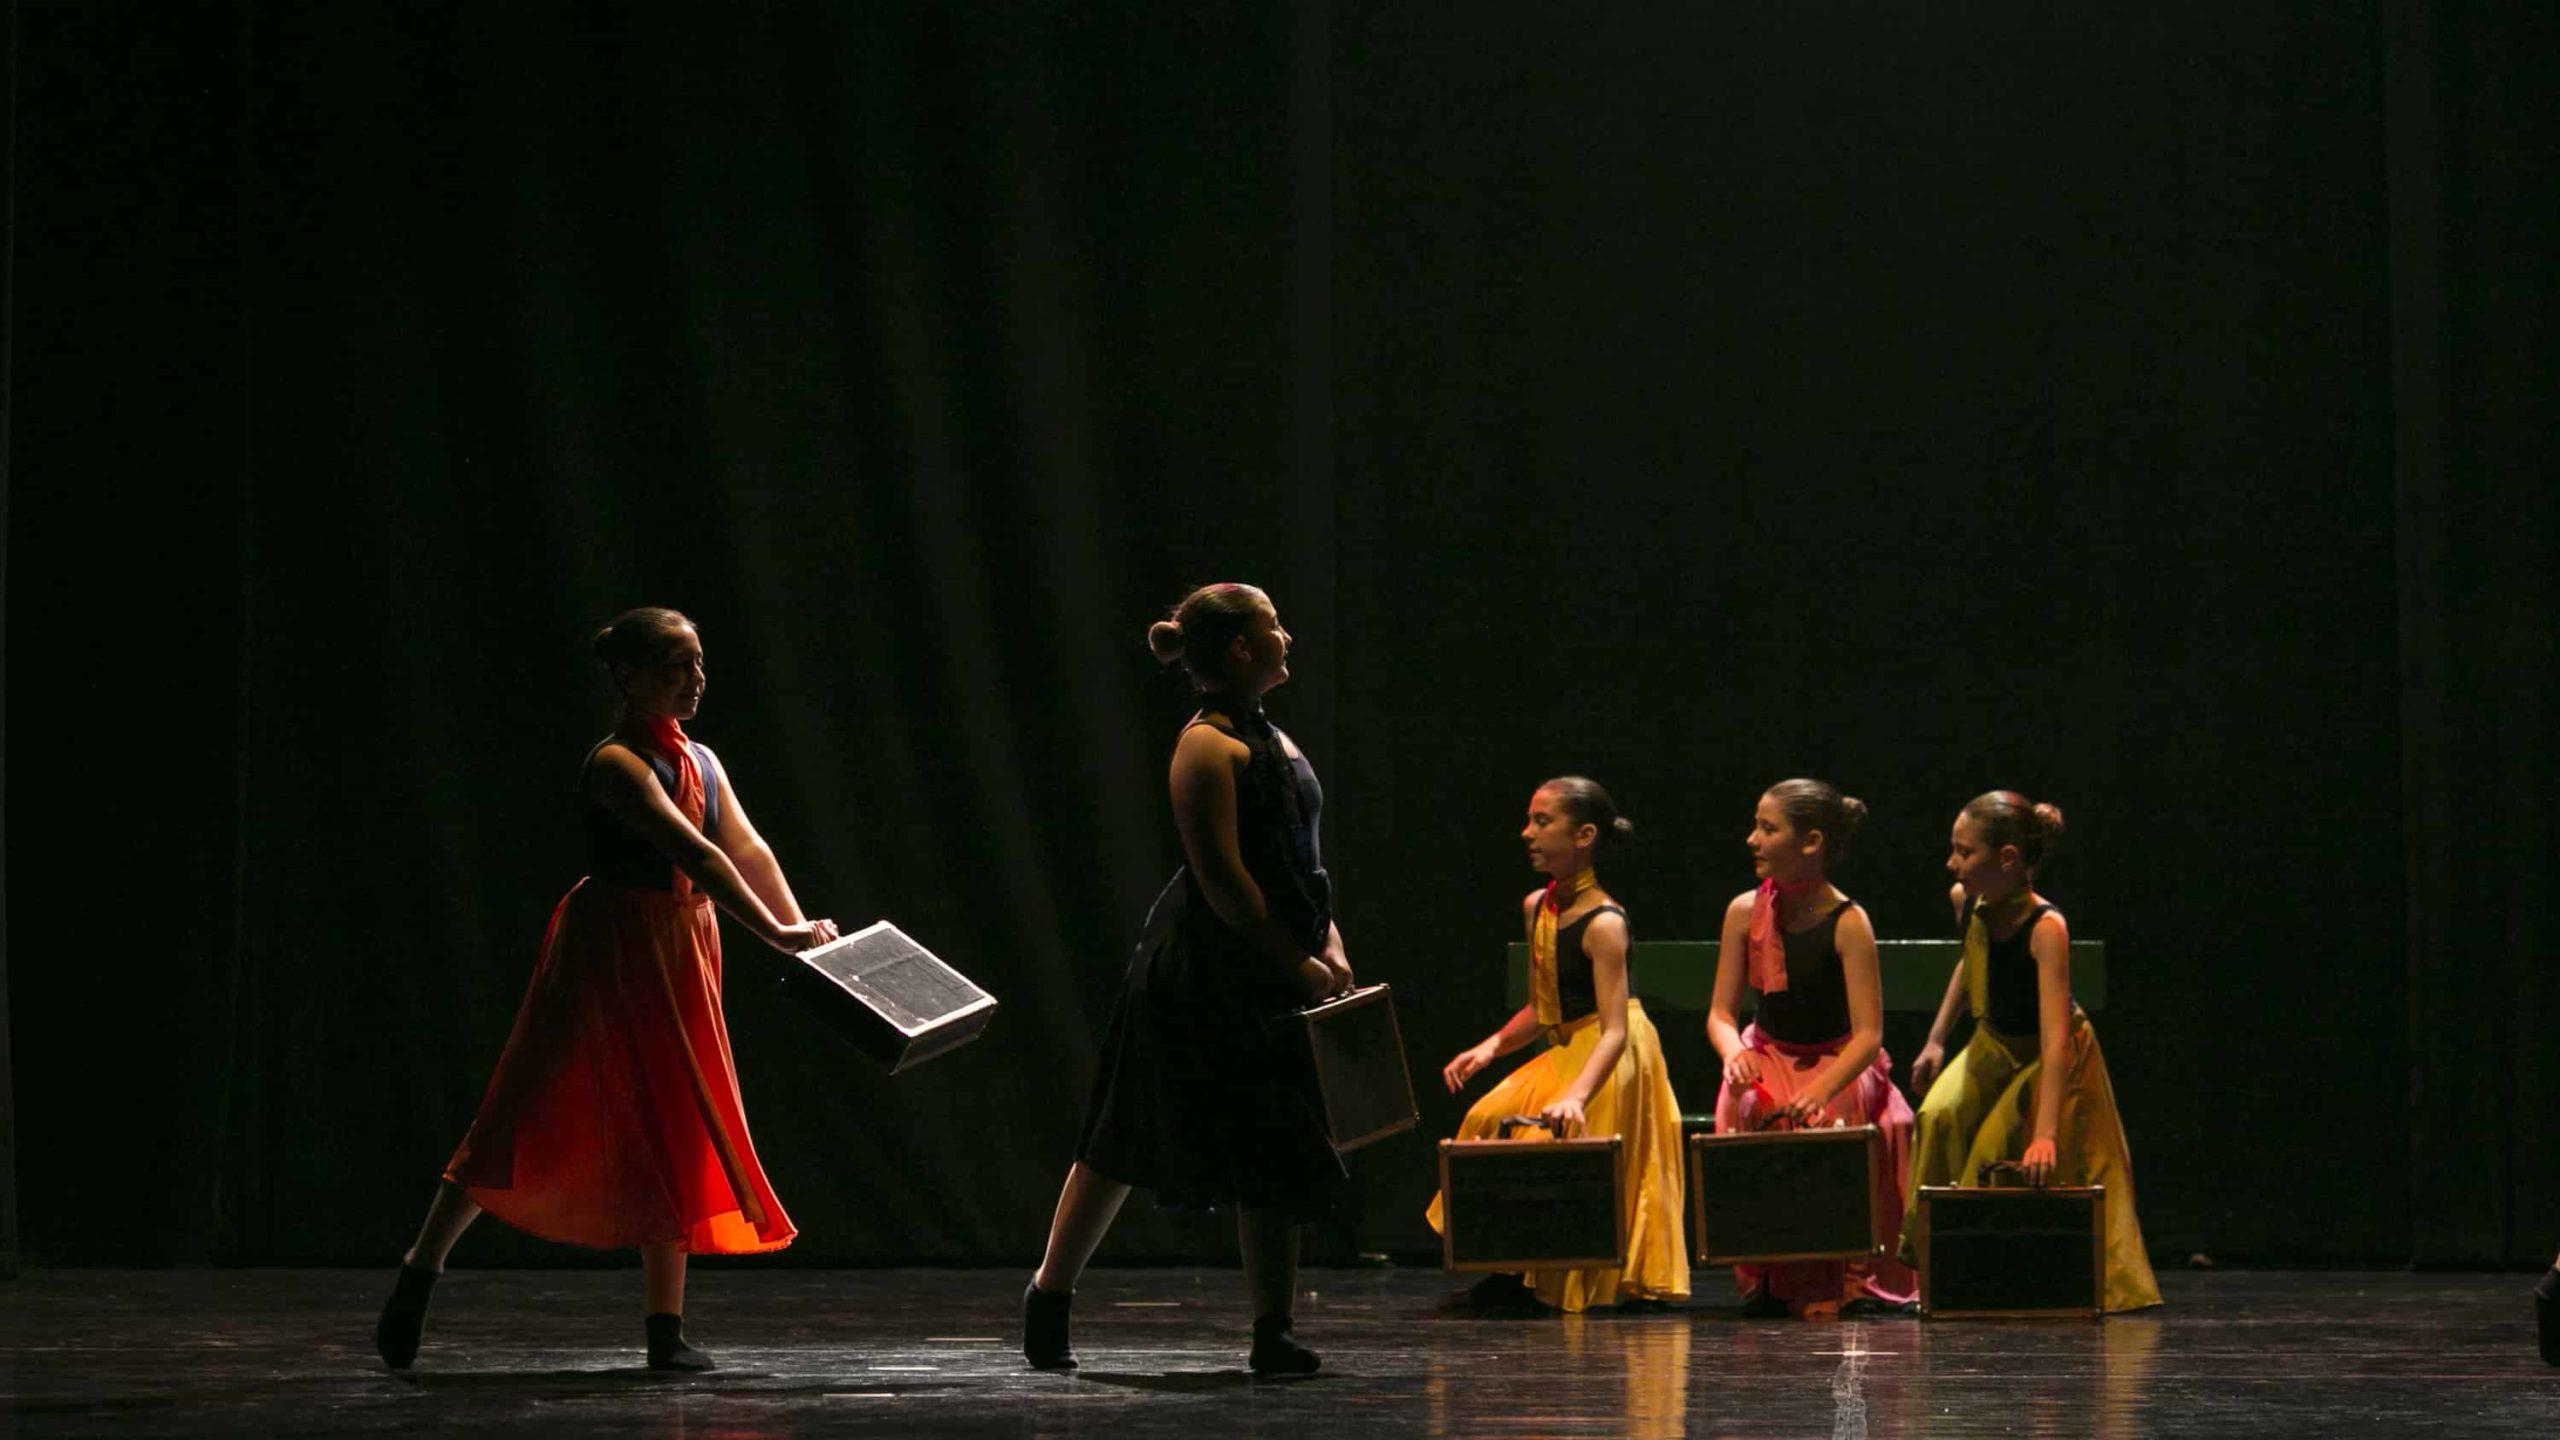 poetar-danzando-18@0.5x